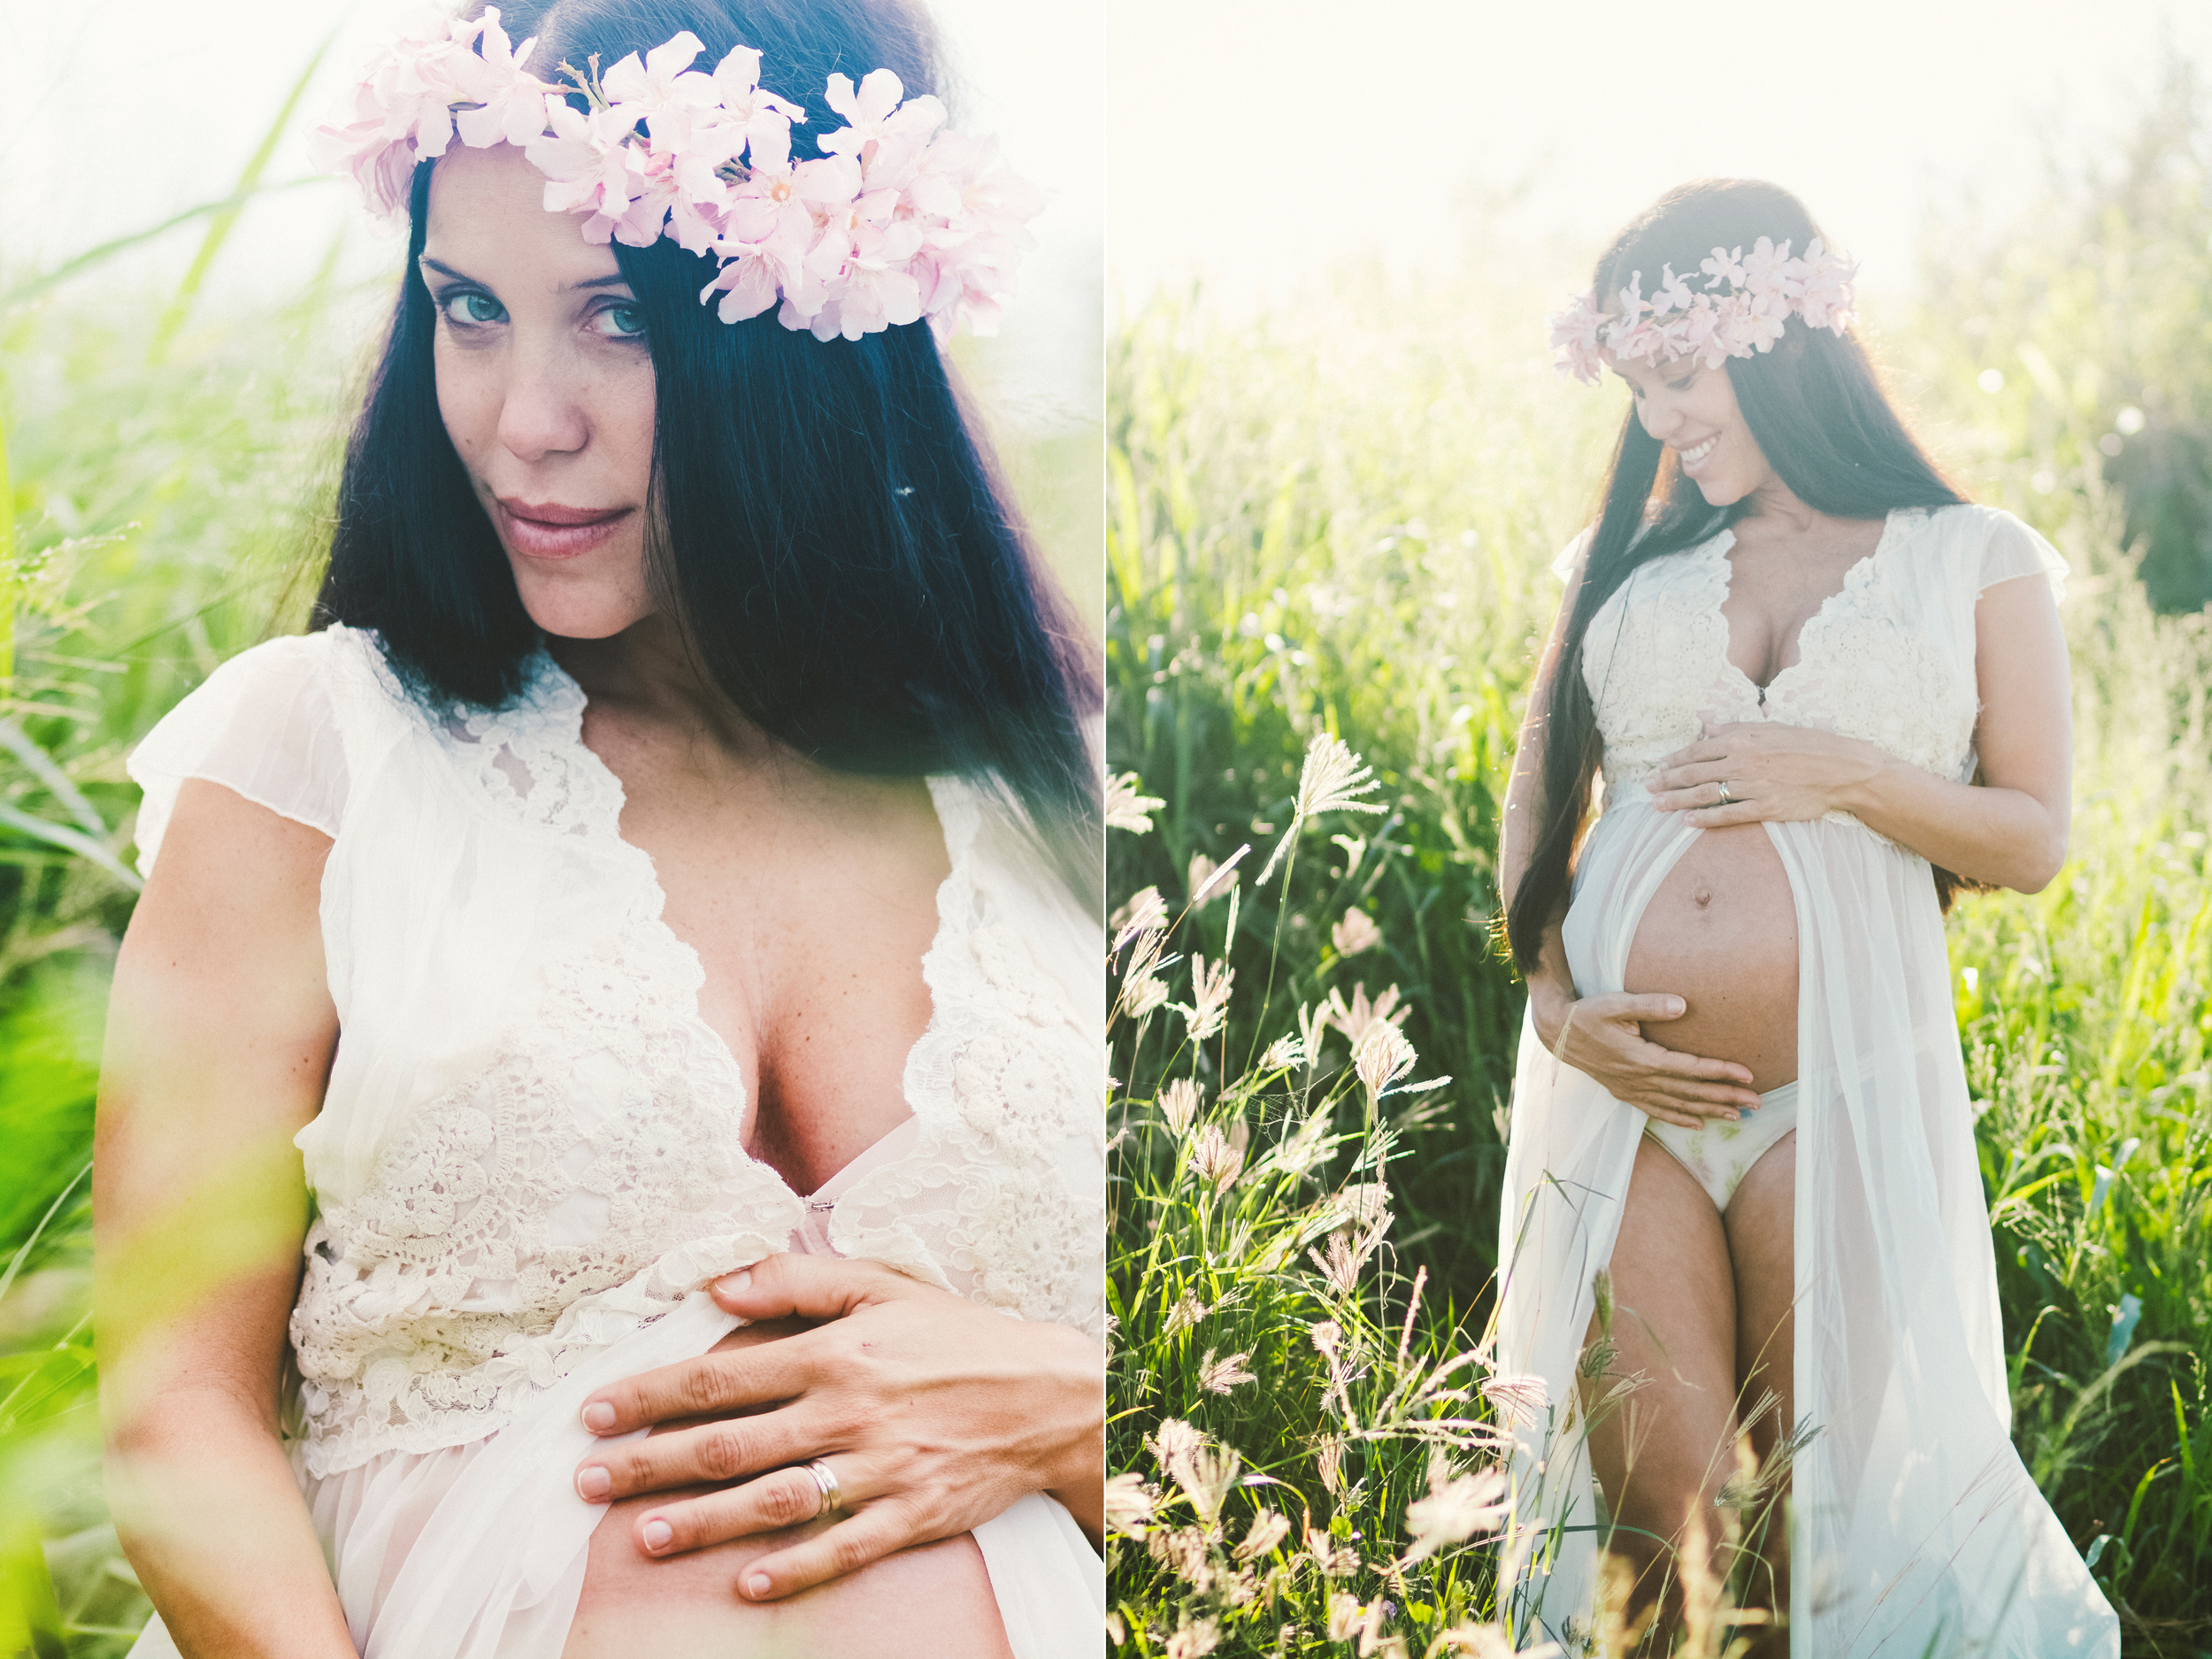 angie-diaz-photography-maui-maternity-twins-7.jpg